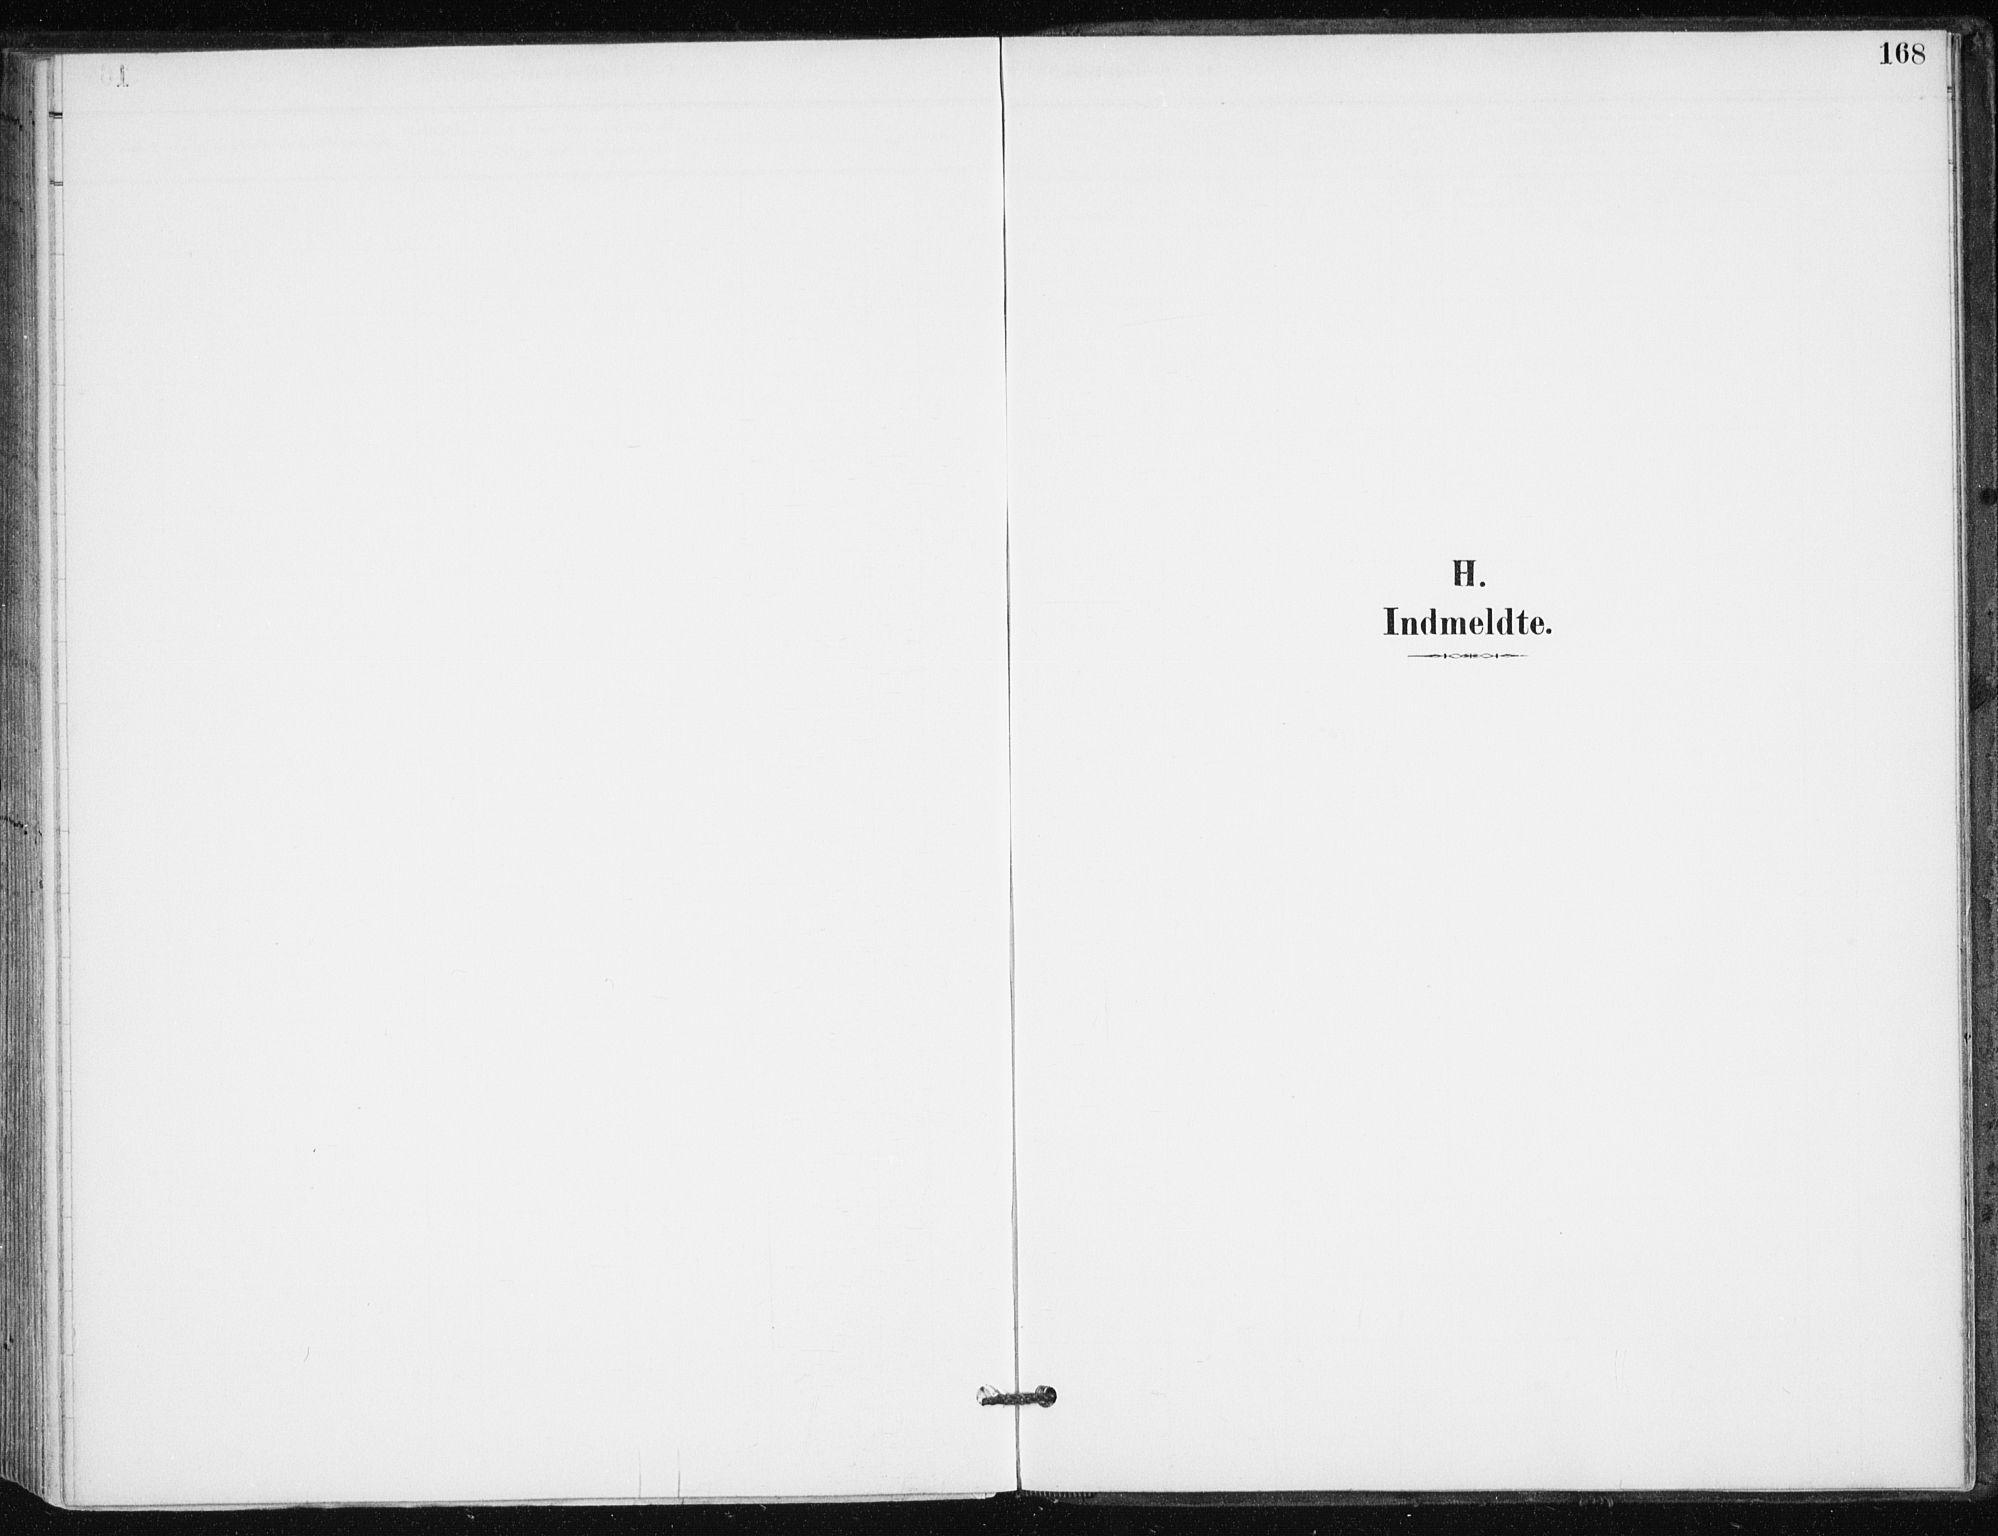 SATØ, Salangen sokneprestembete, Ministerialbok nr. 1, 1893-1911, s. 168